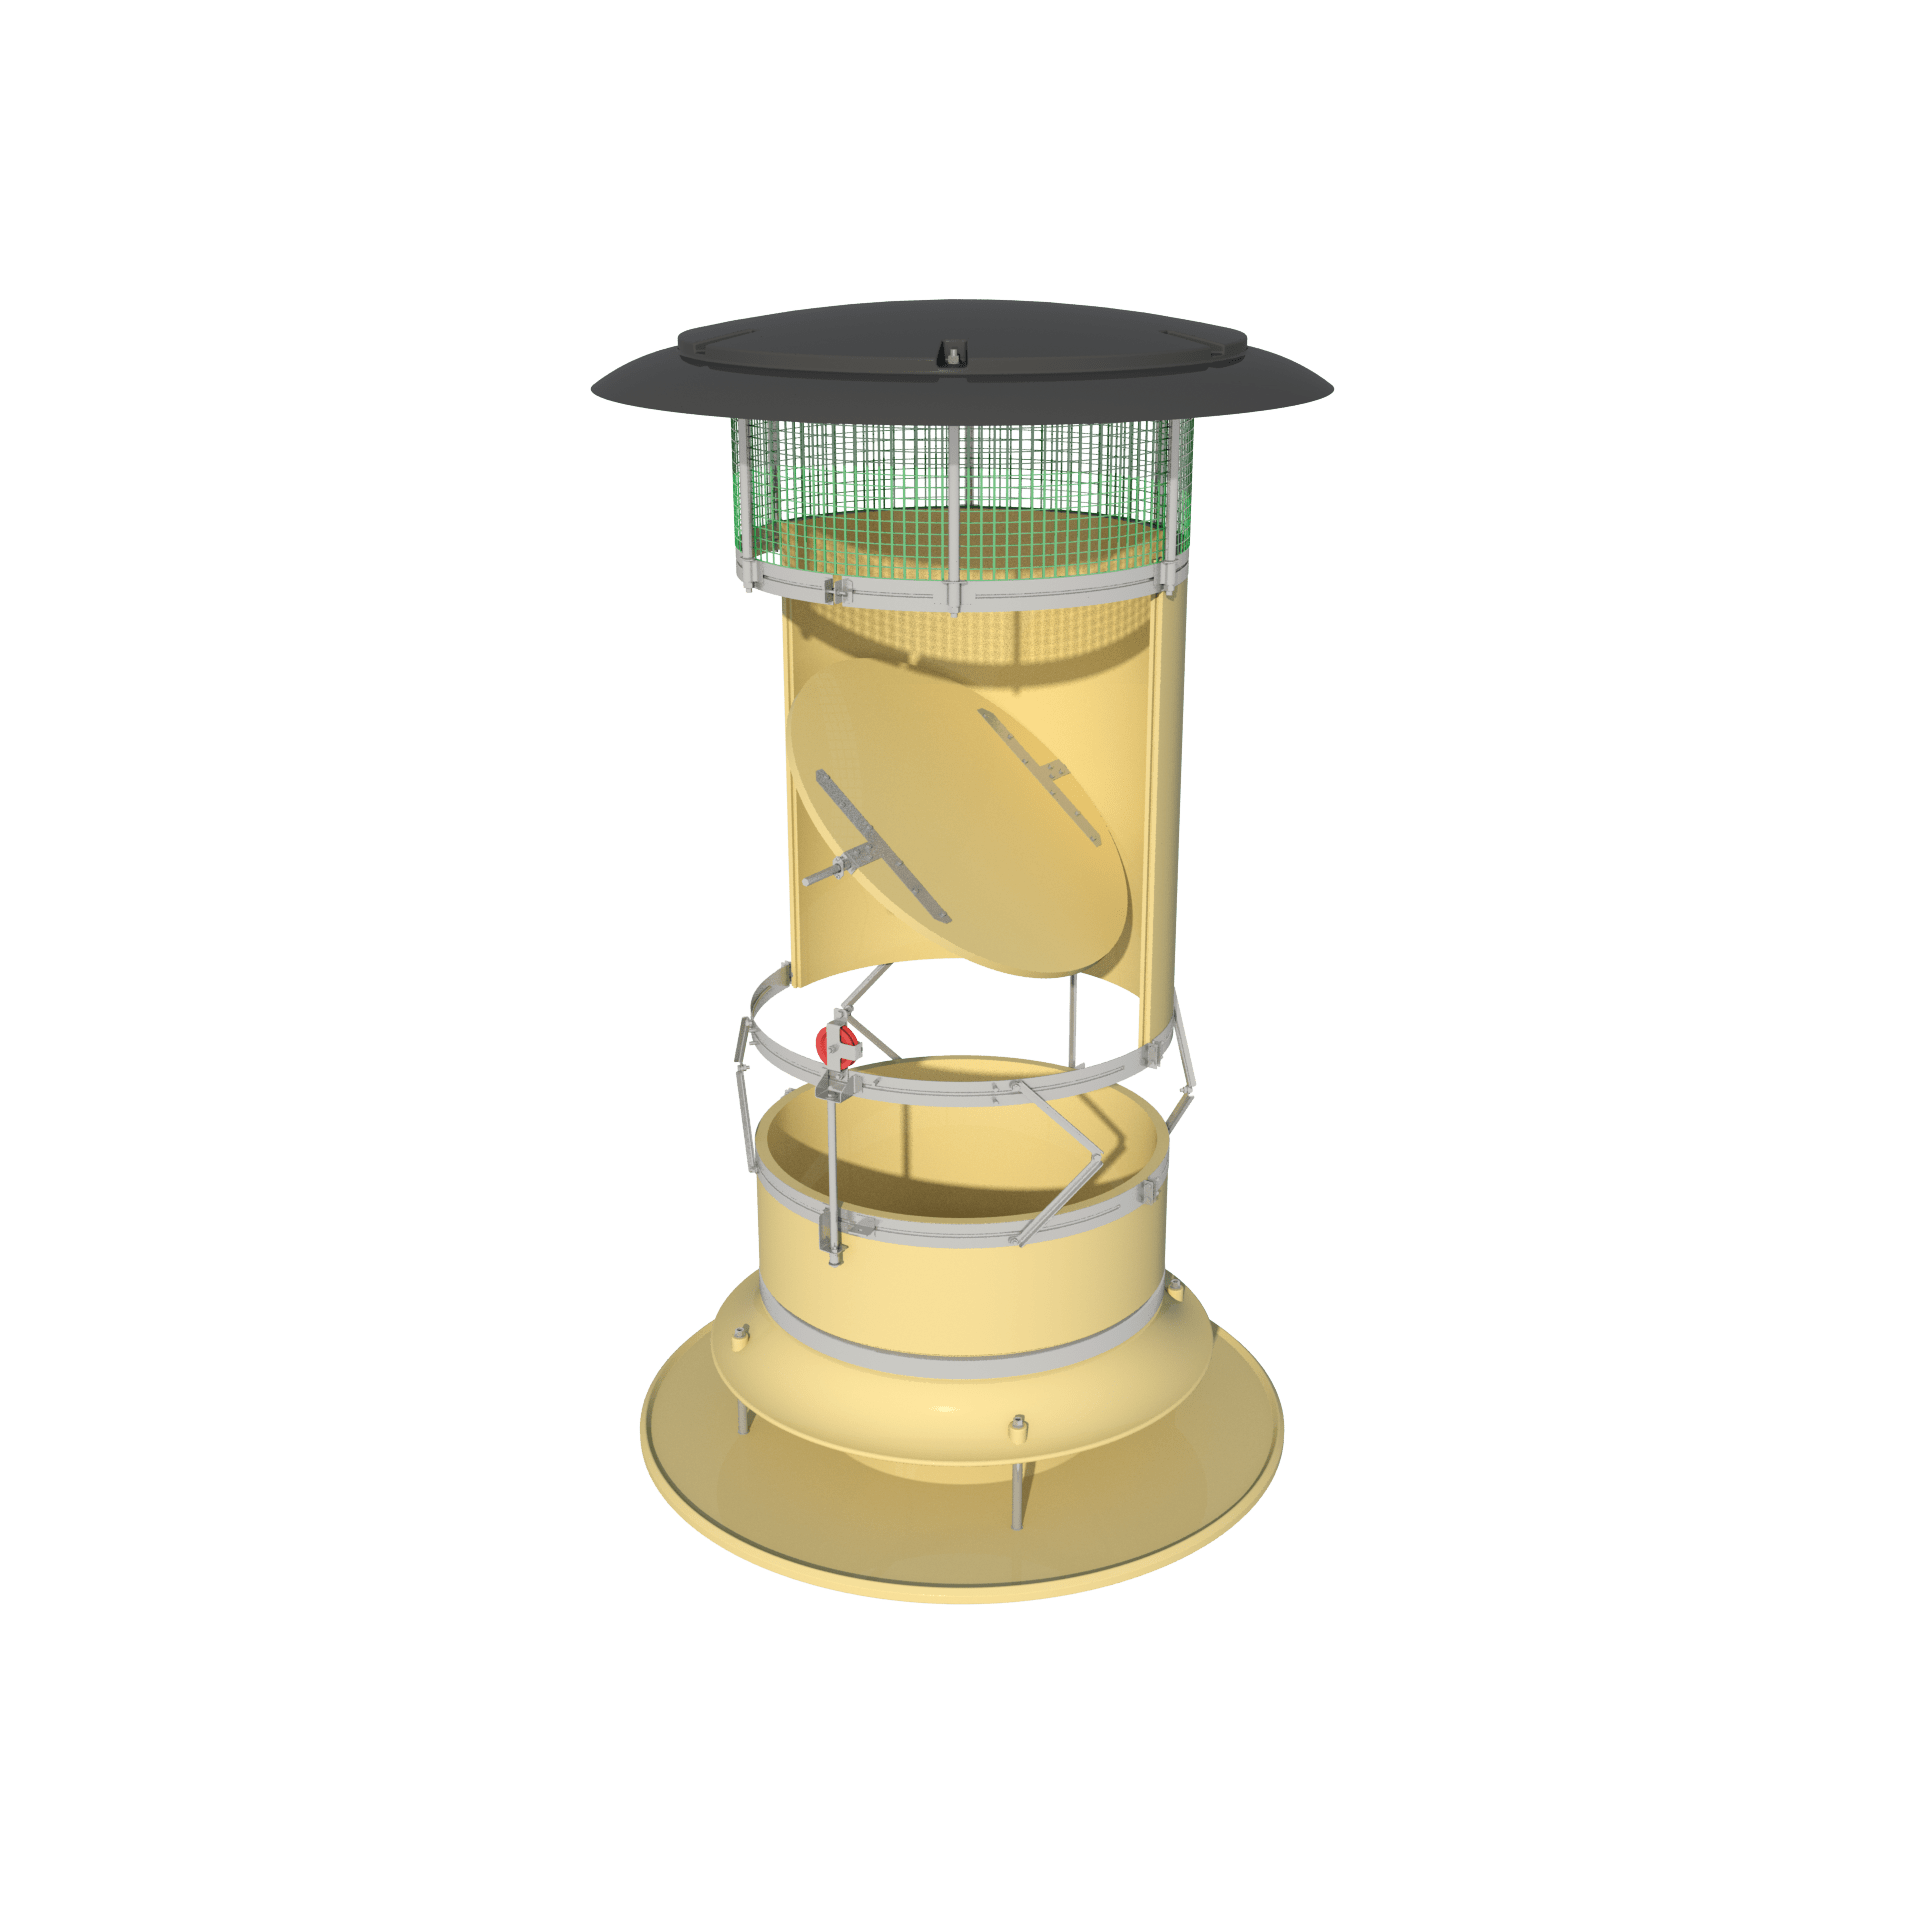 ARC-F (Automatic Recirculation Chimney-Fixed)